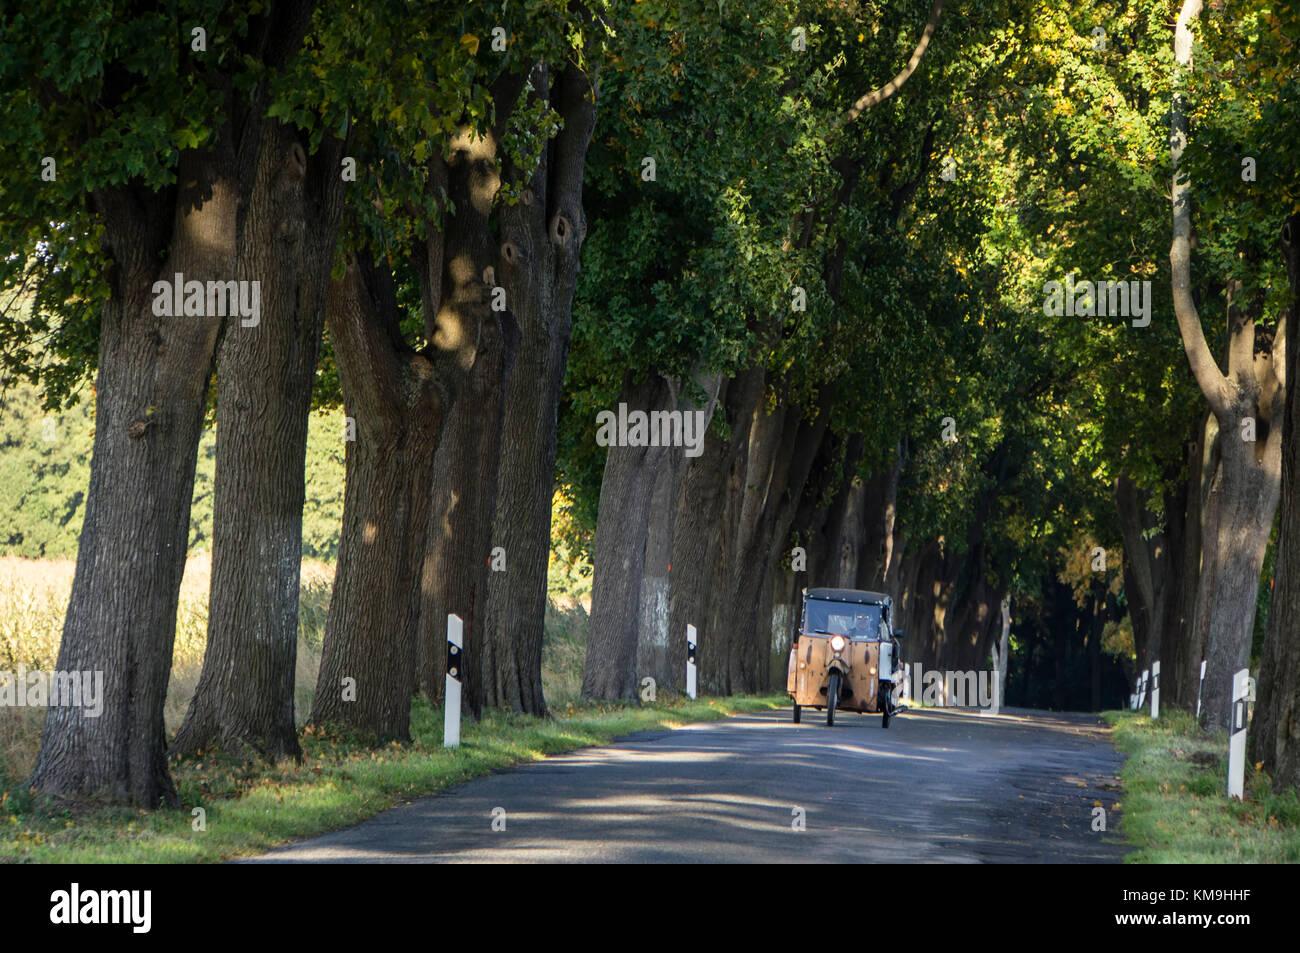 Maple Alley  with old DDR three wheeler,  Ruedniz, Brandenburg, Germany - Stock Image